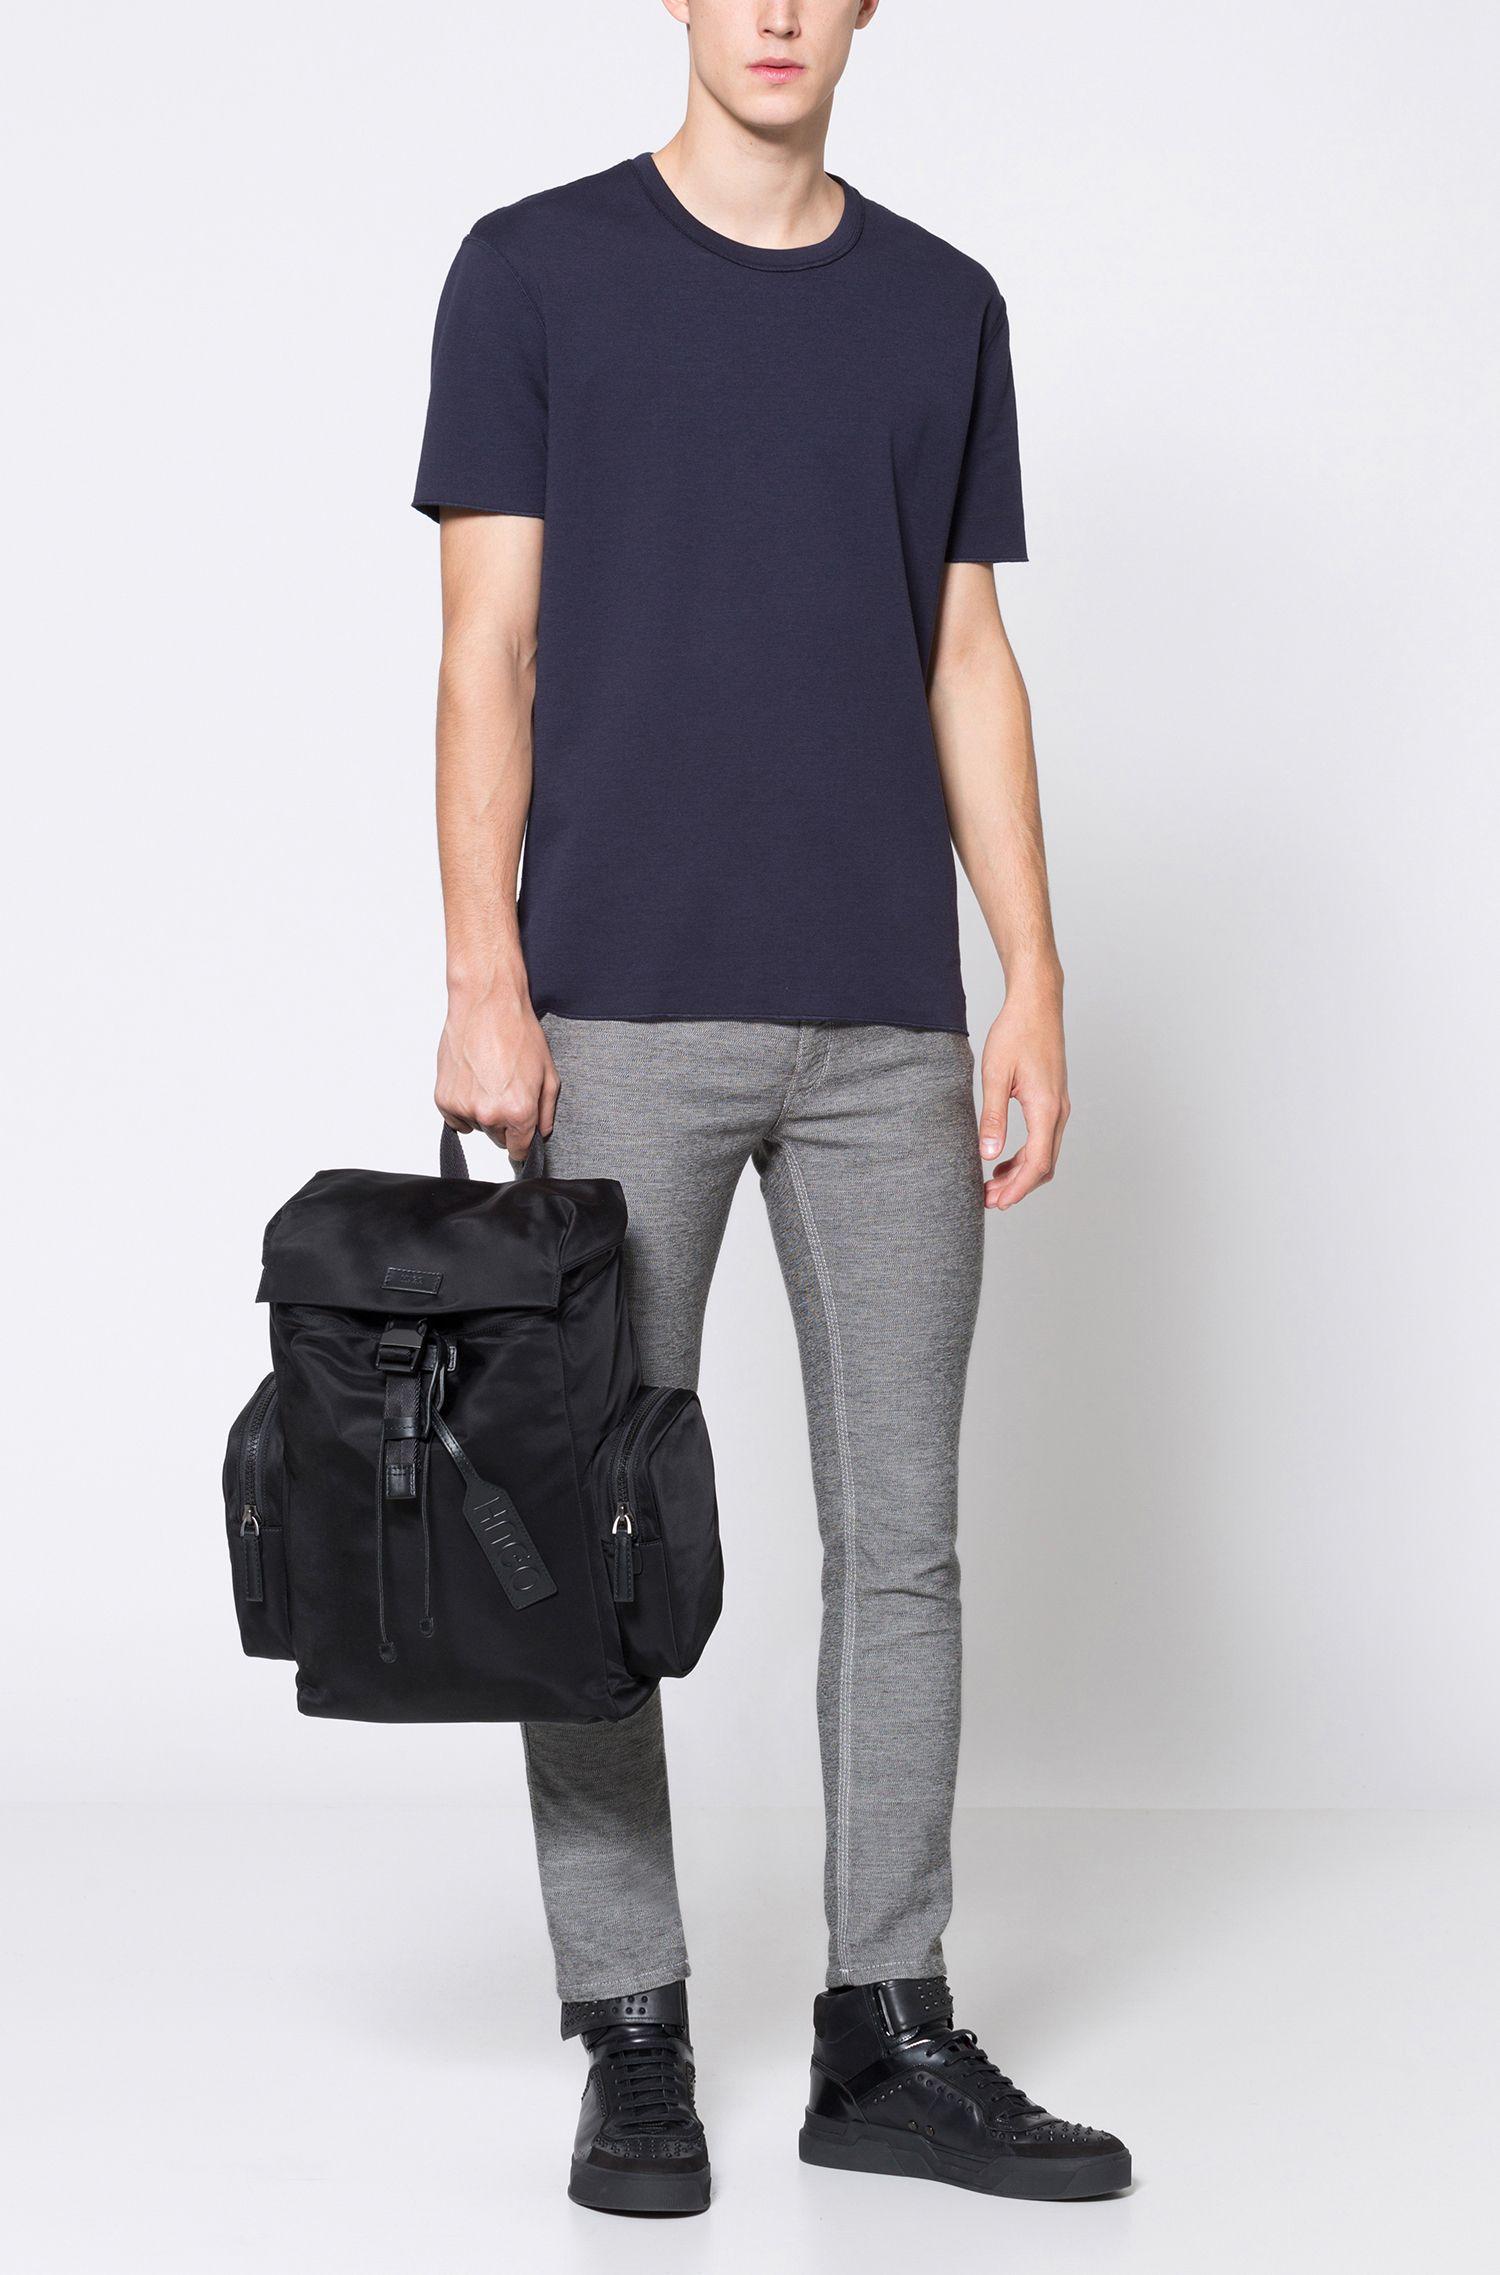 Cotton Blend T-Shirt   Dendrix